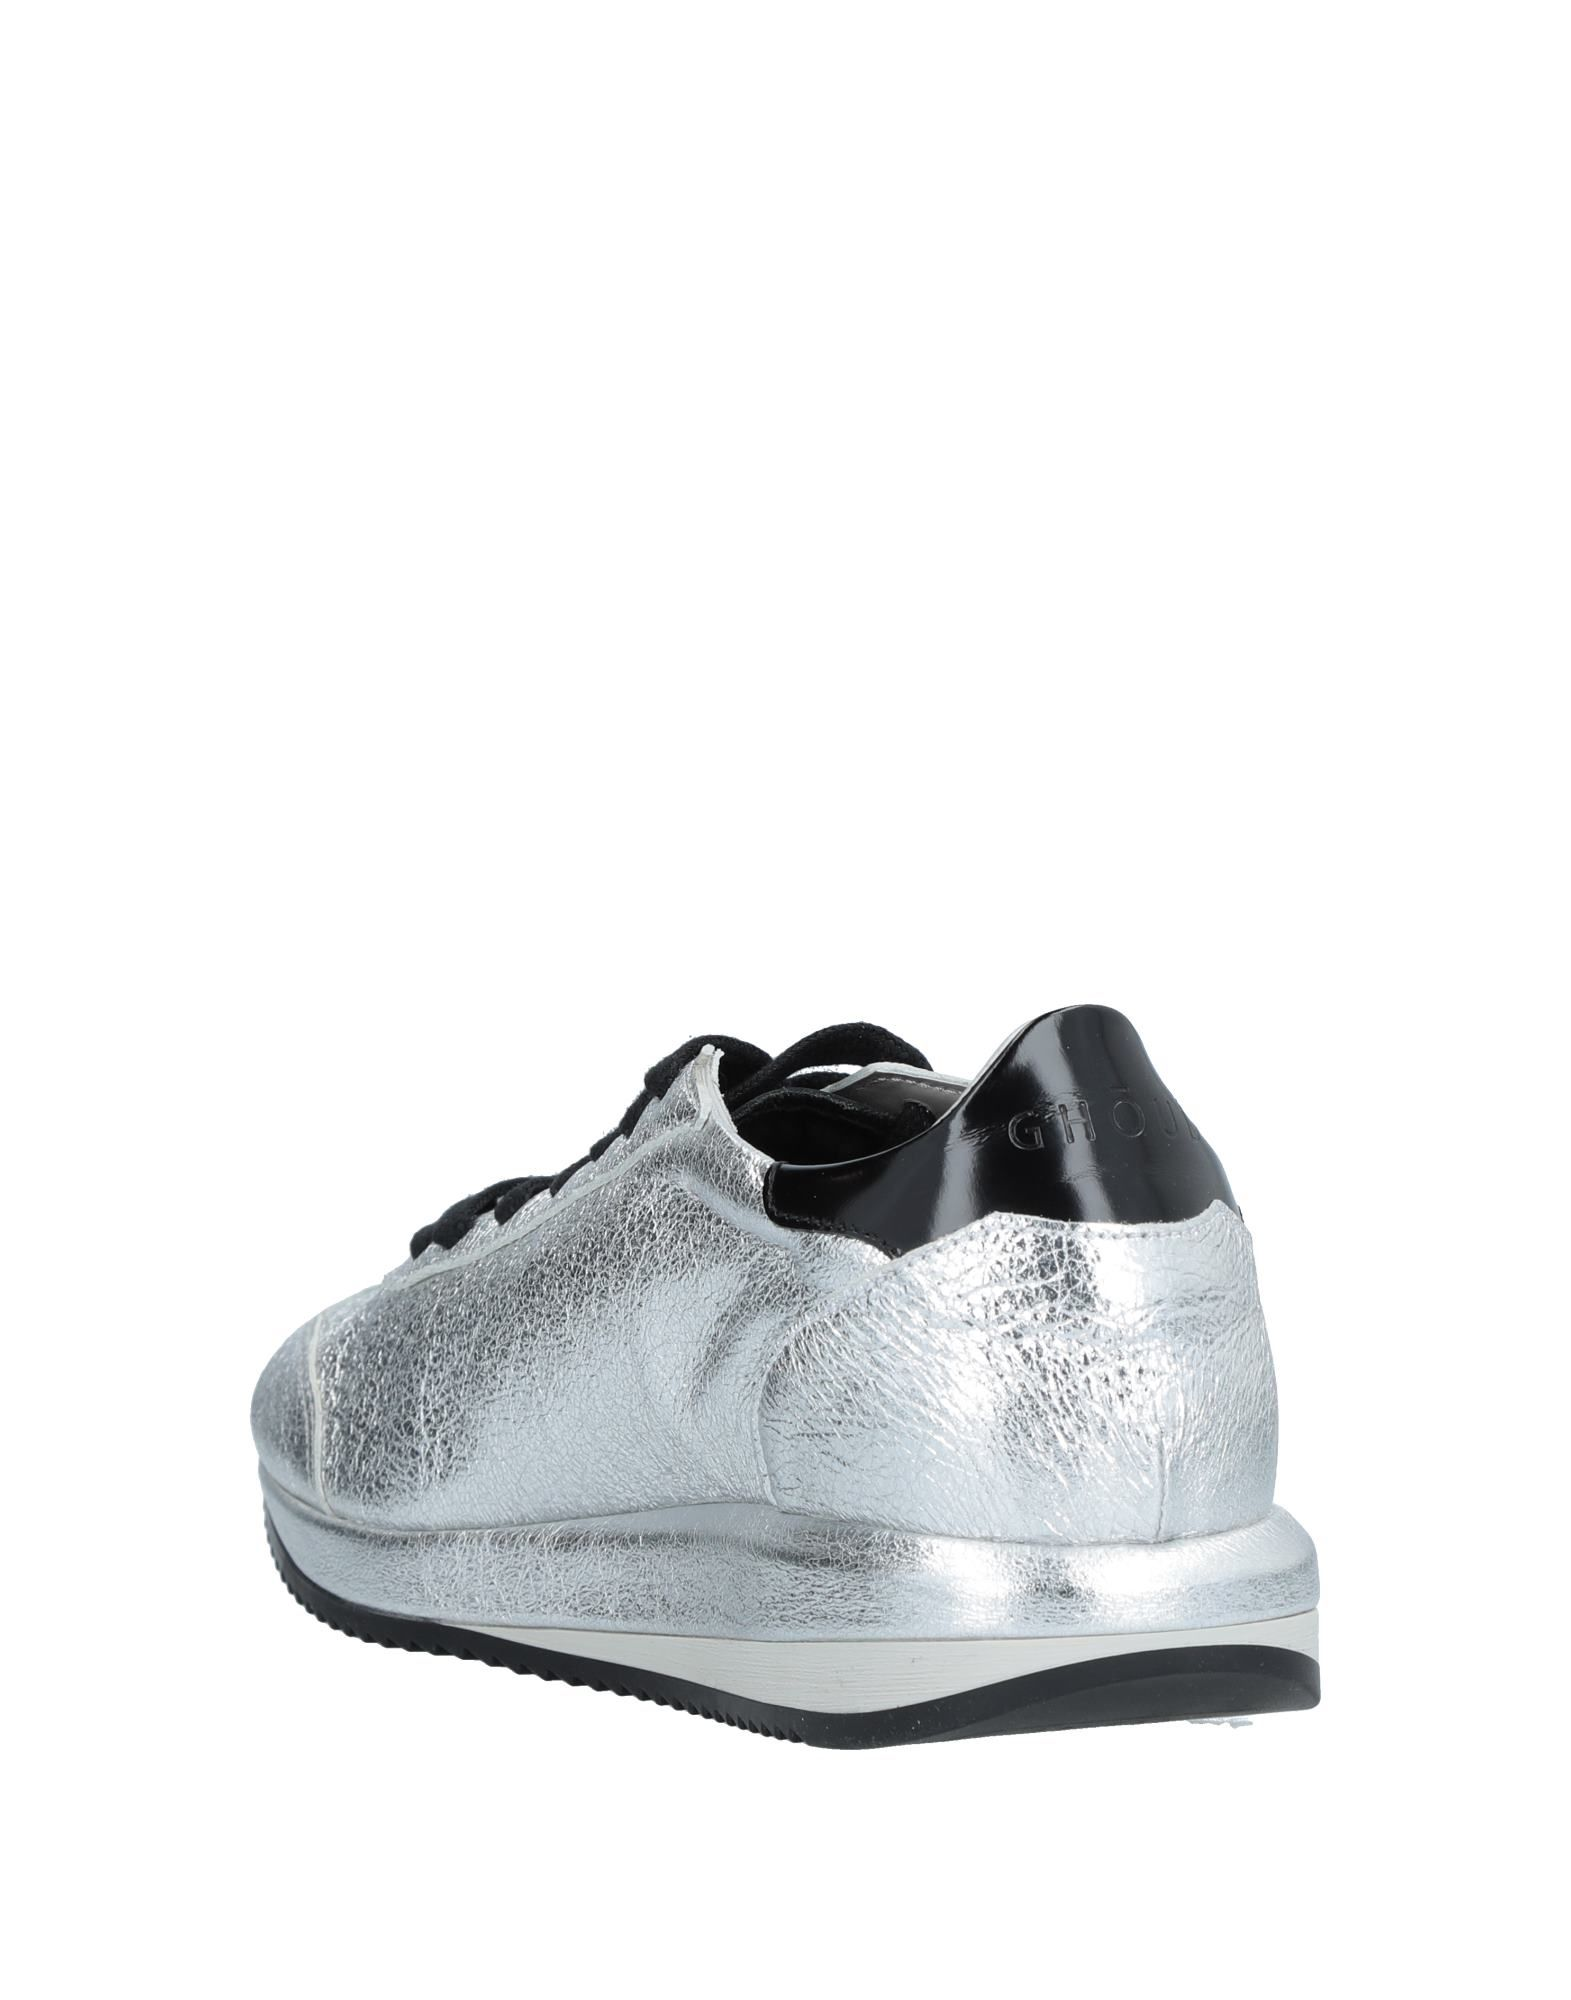 Ghōud strapazierfähige Venice Sneakers Damen  11497724FFGut aussehende strapazierfähige Ghōud Schuhe 6a1e83